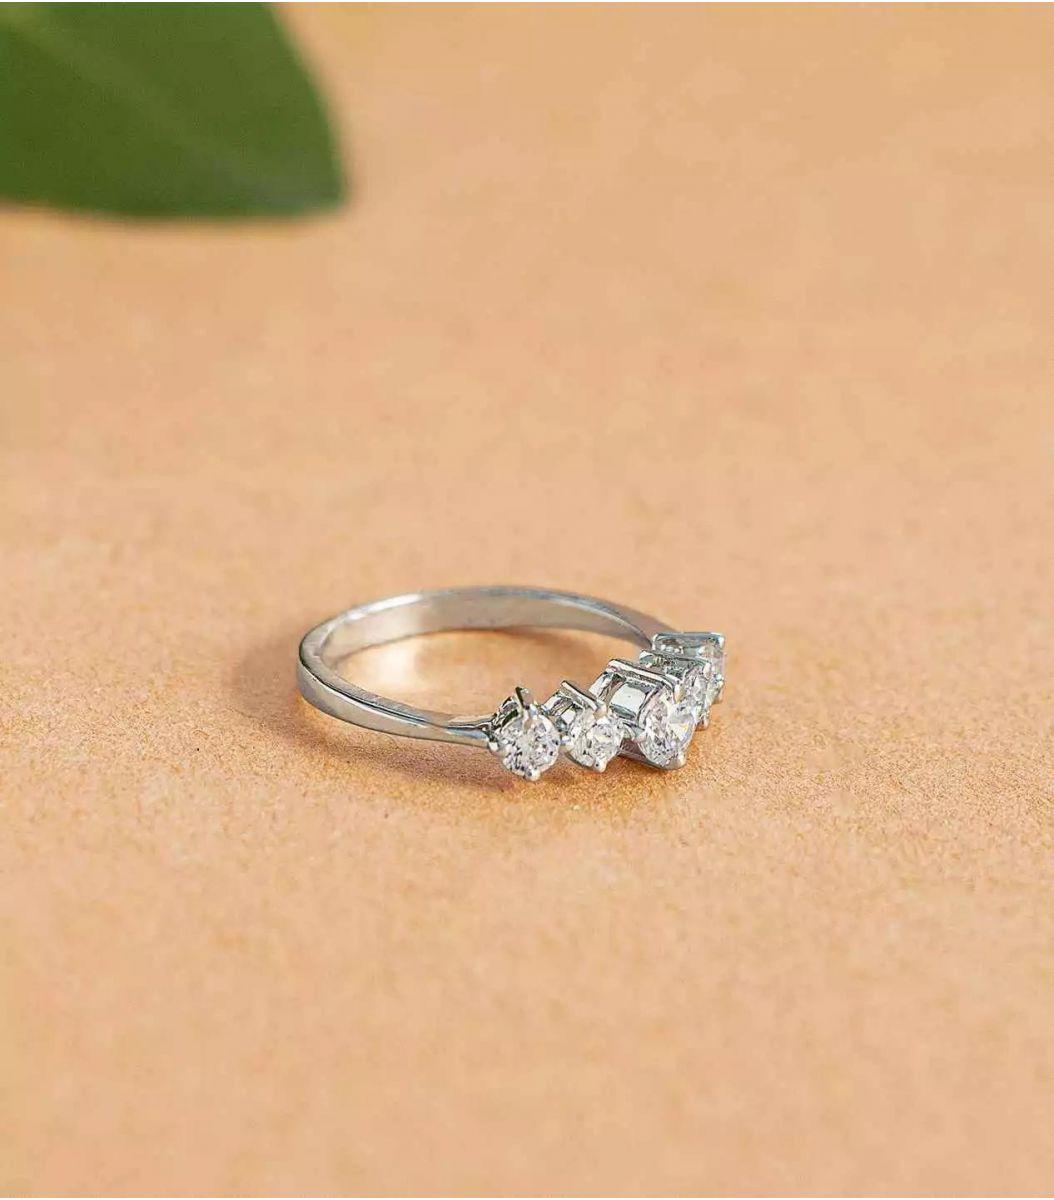 Silver Stone Finger Ring FJ1660173